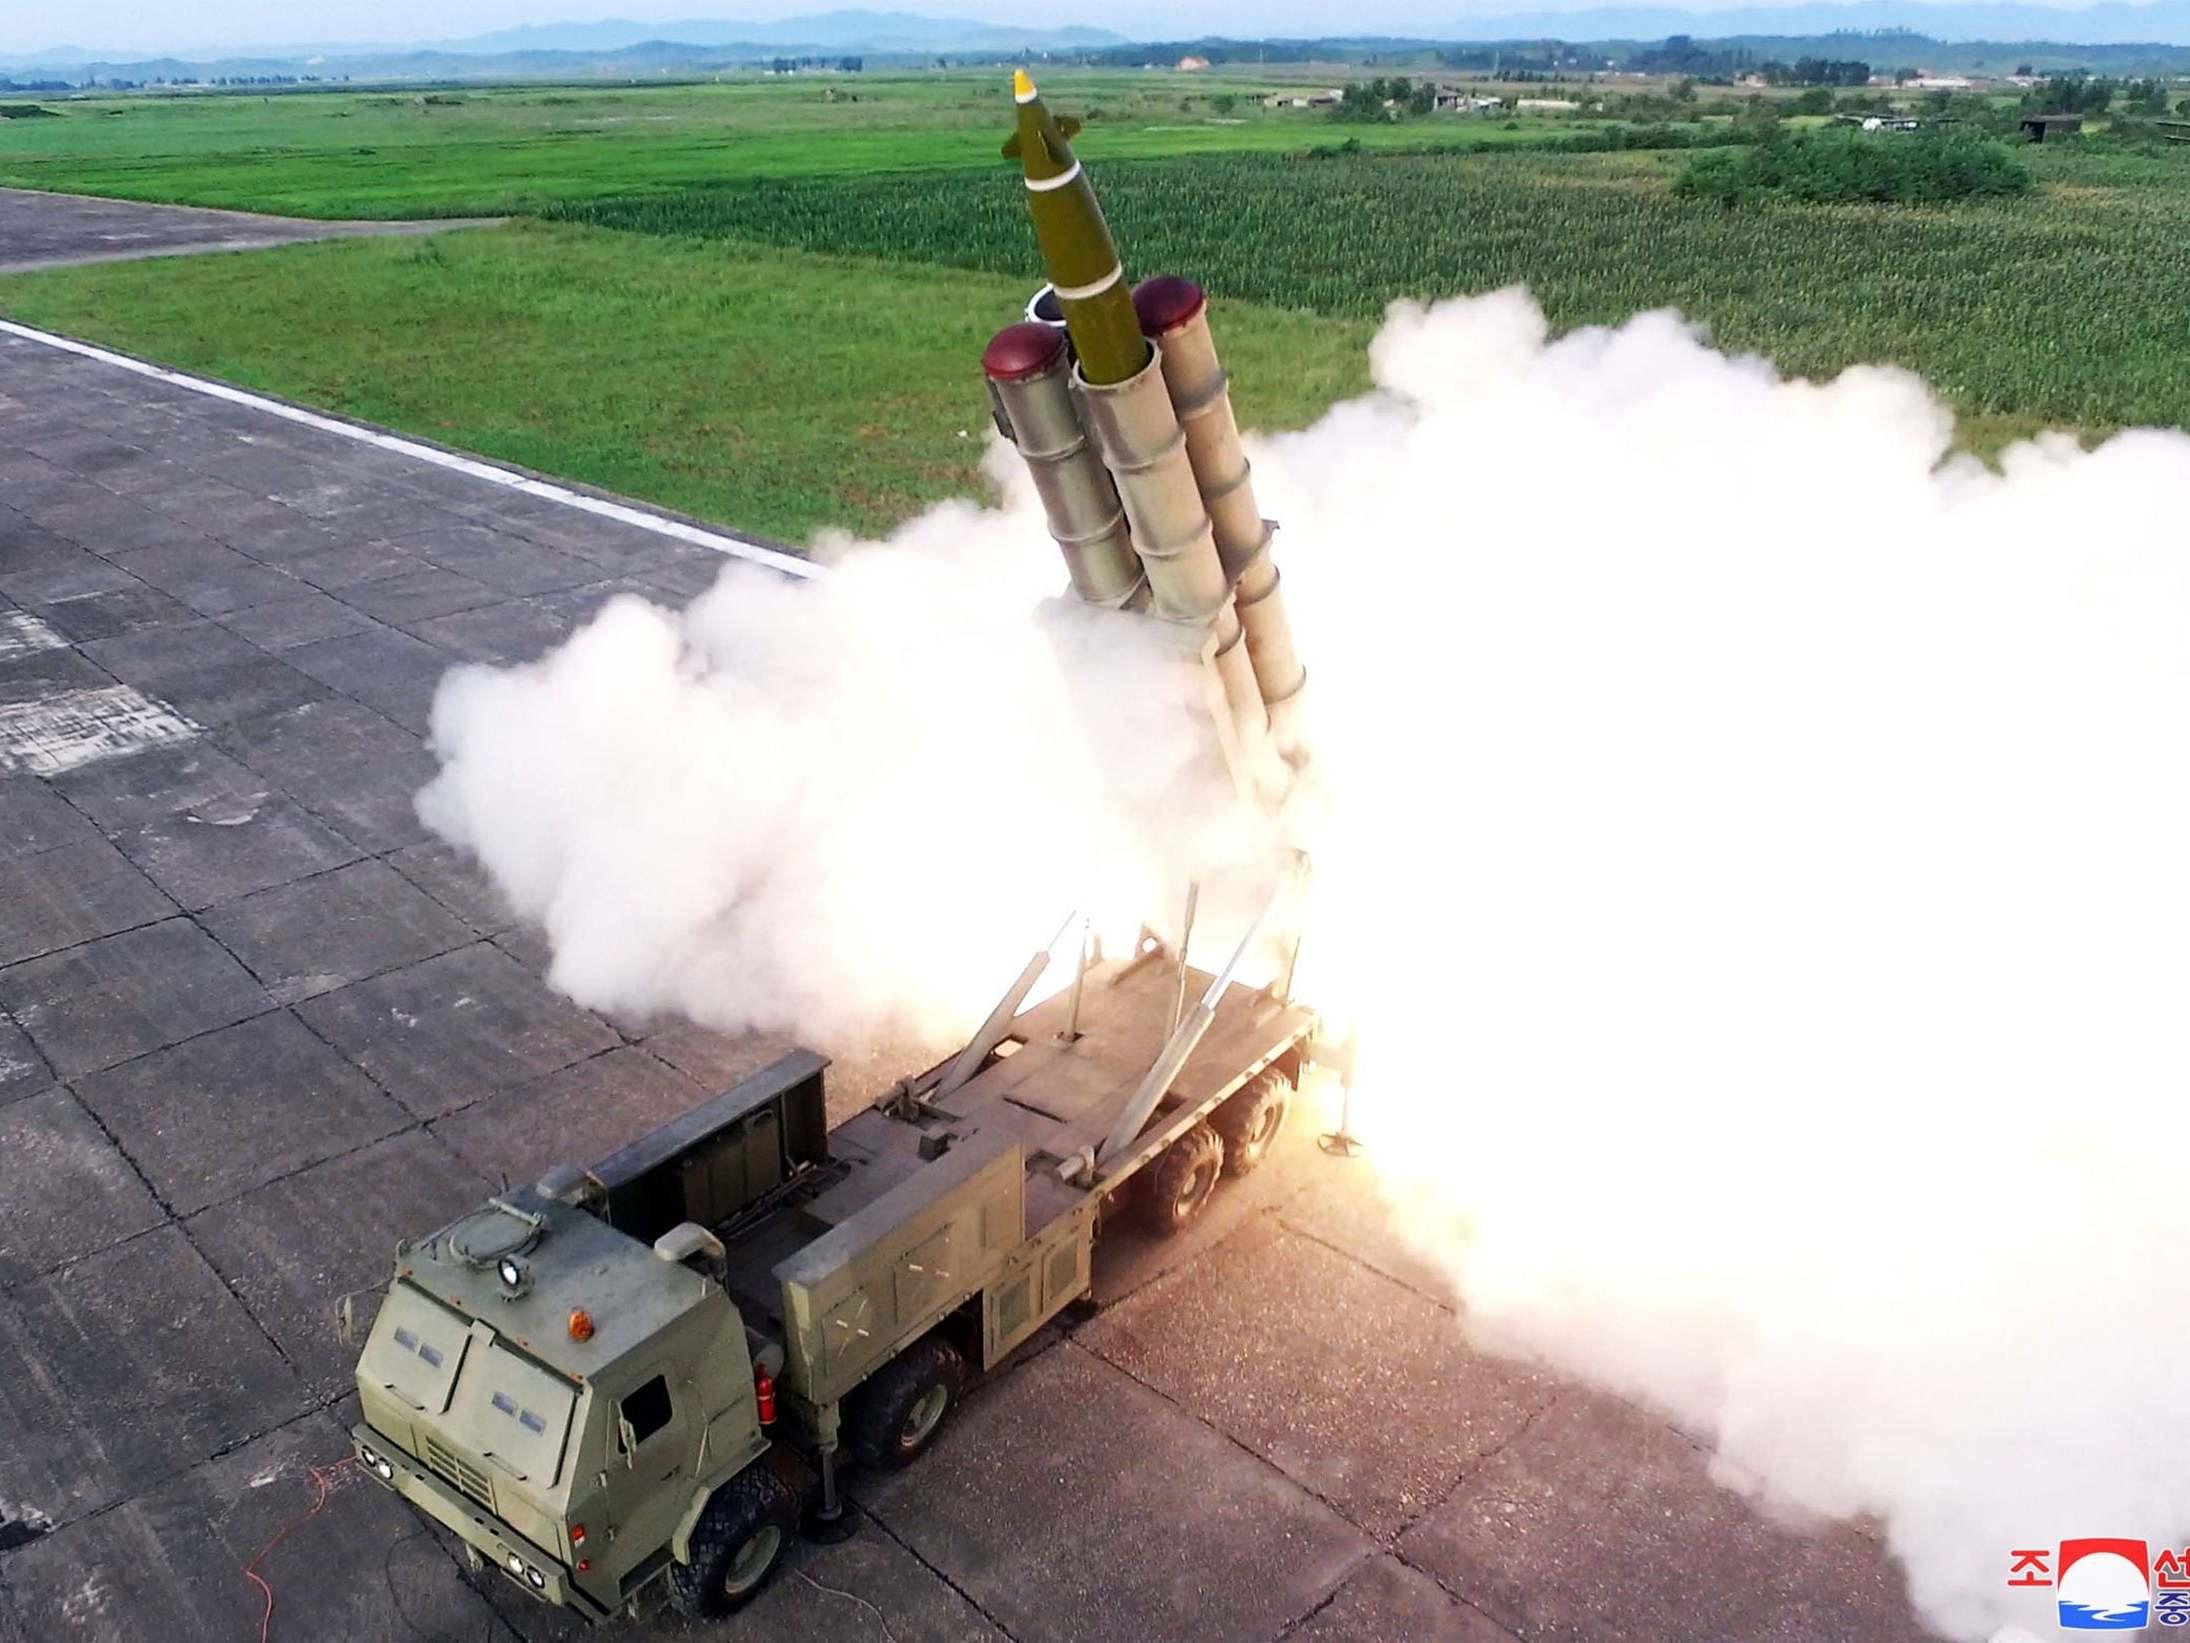 North Korea developing advanced warheads to penetrate